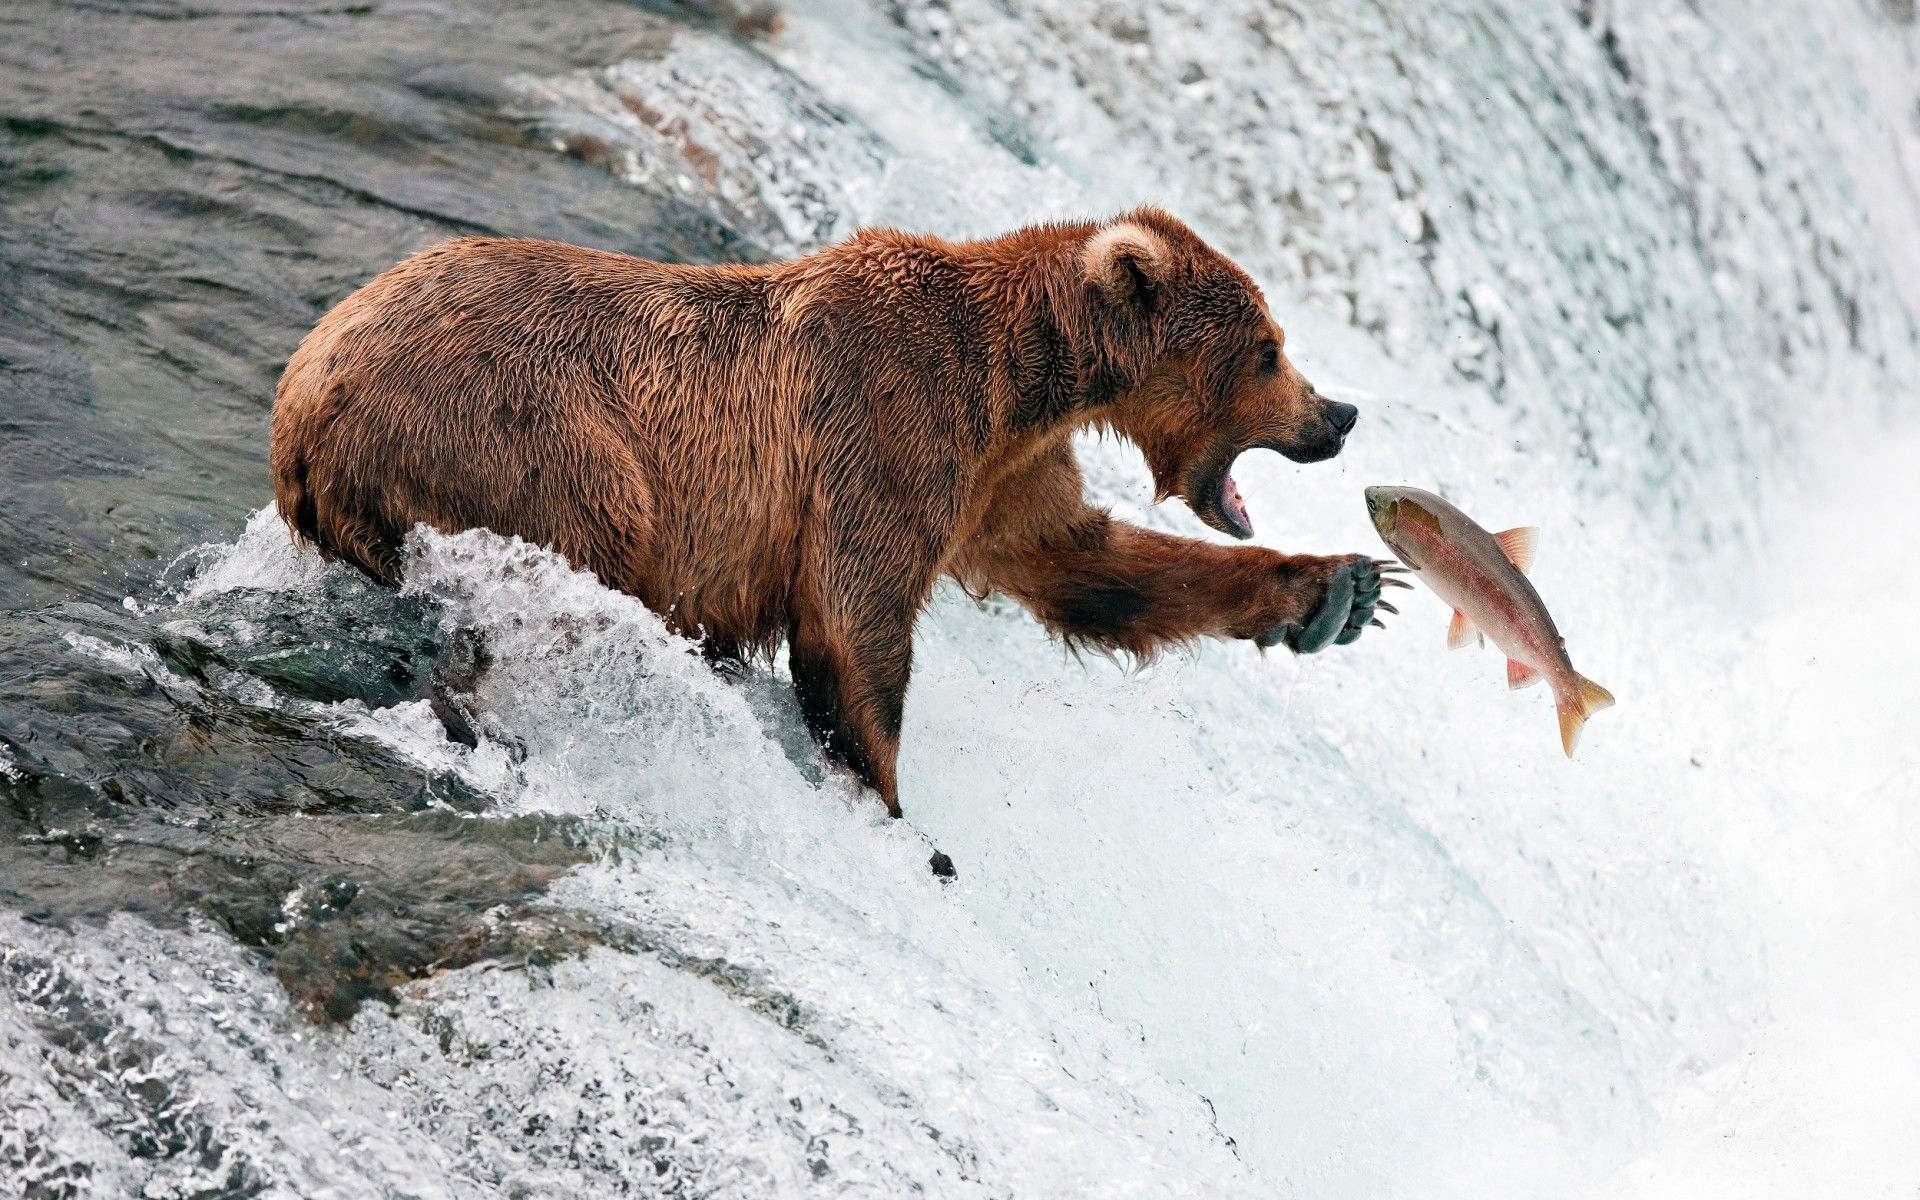 Bear Wallpaper, river, stream, fish, fishing HD